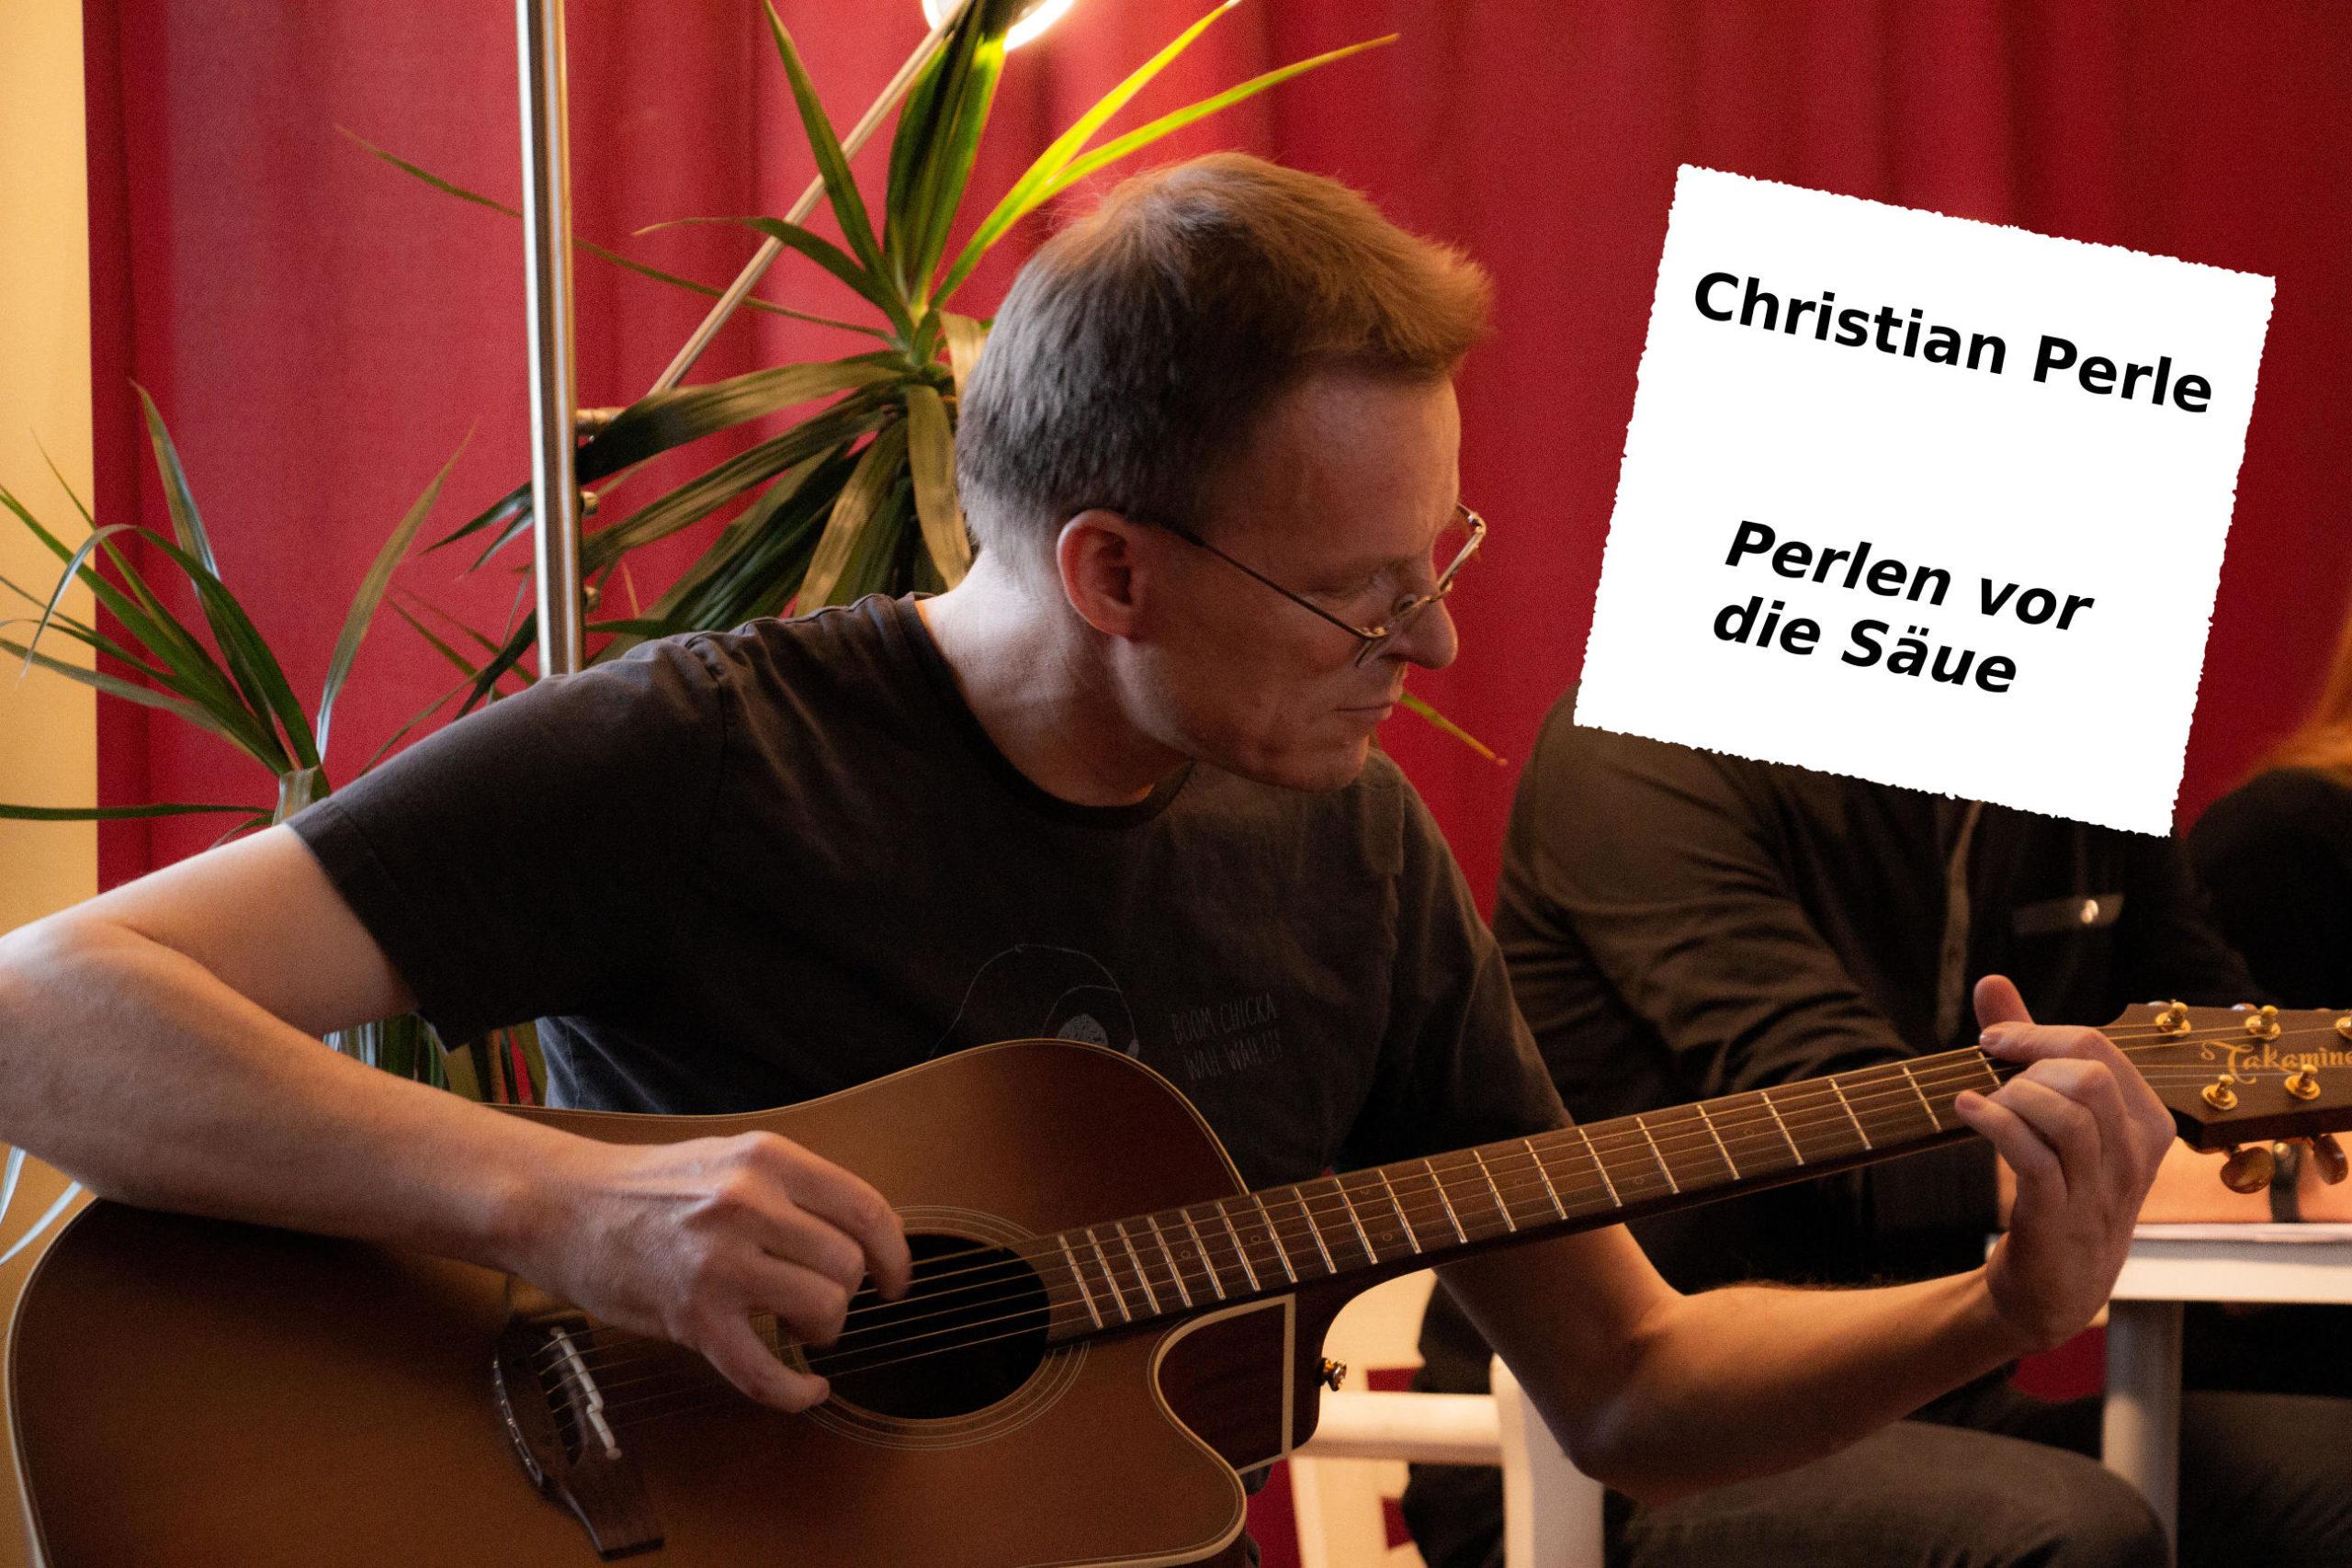 Christian Perle